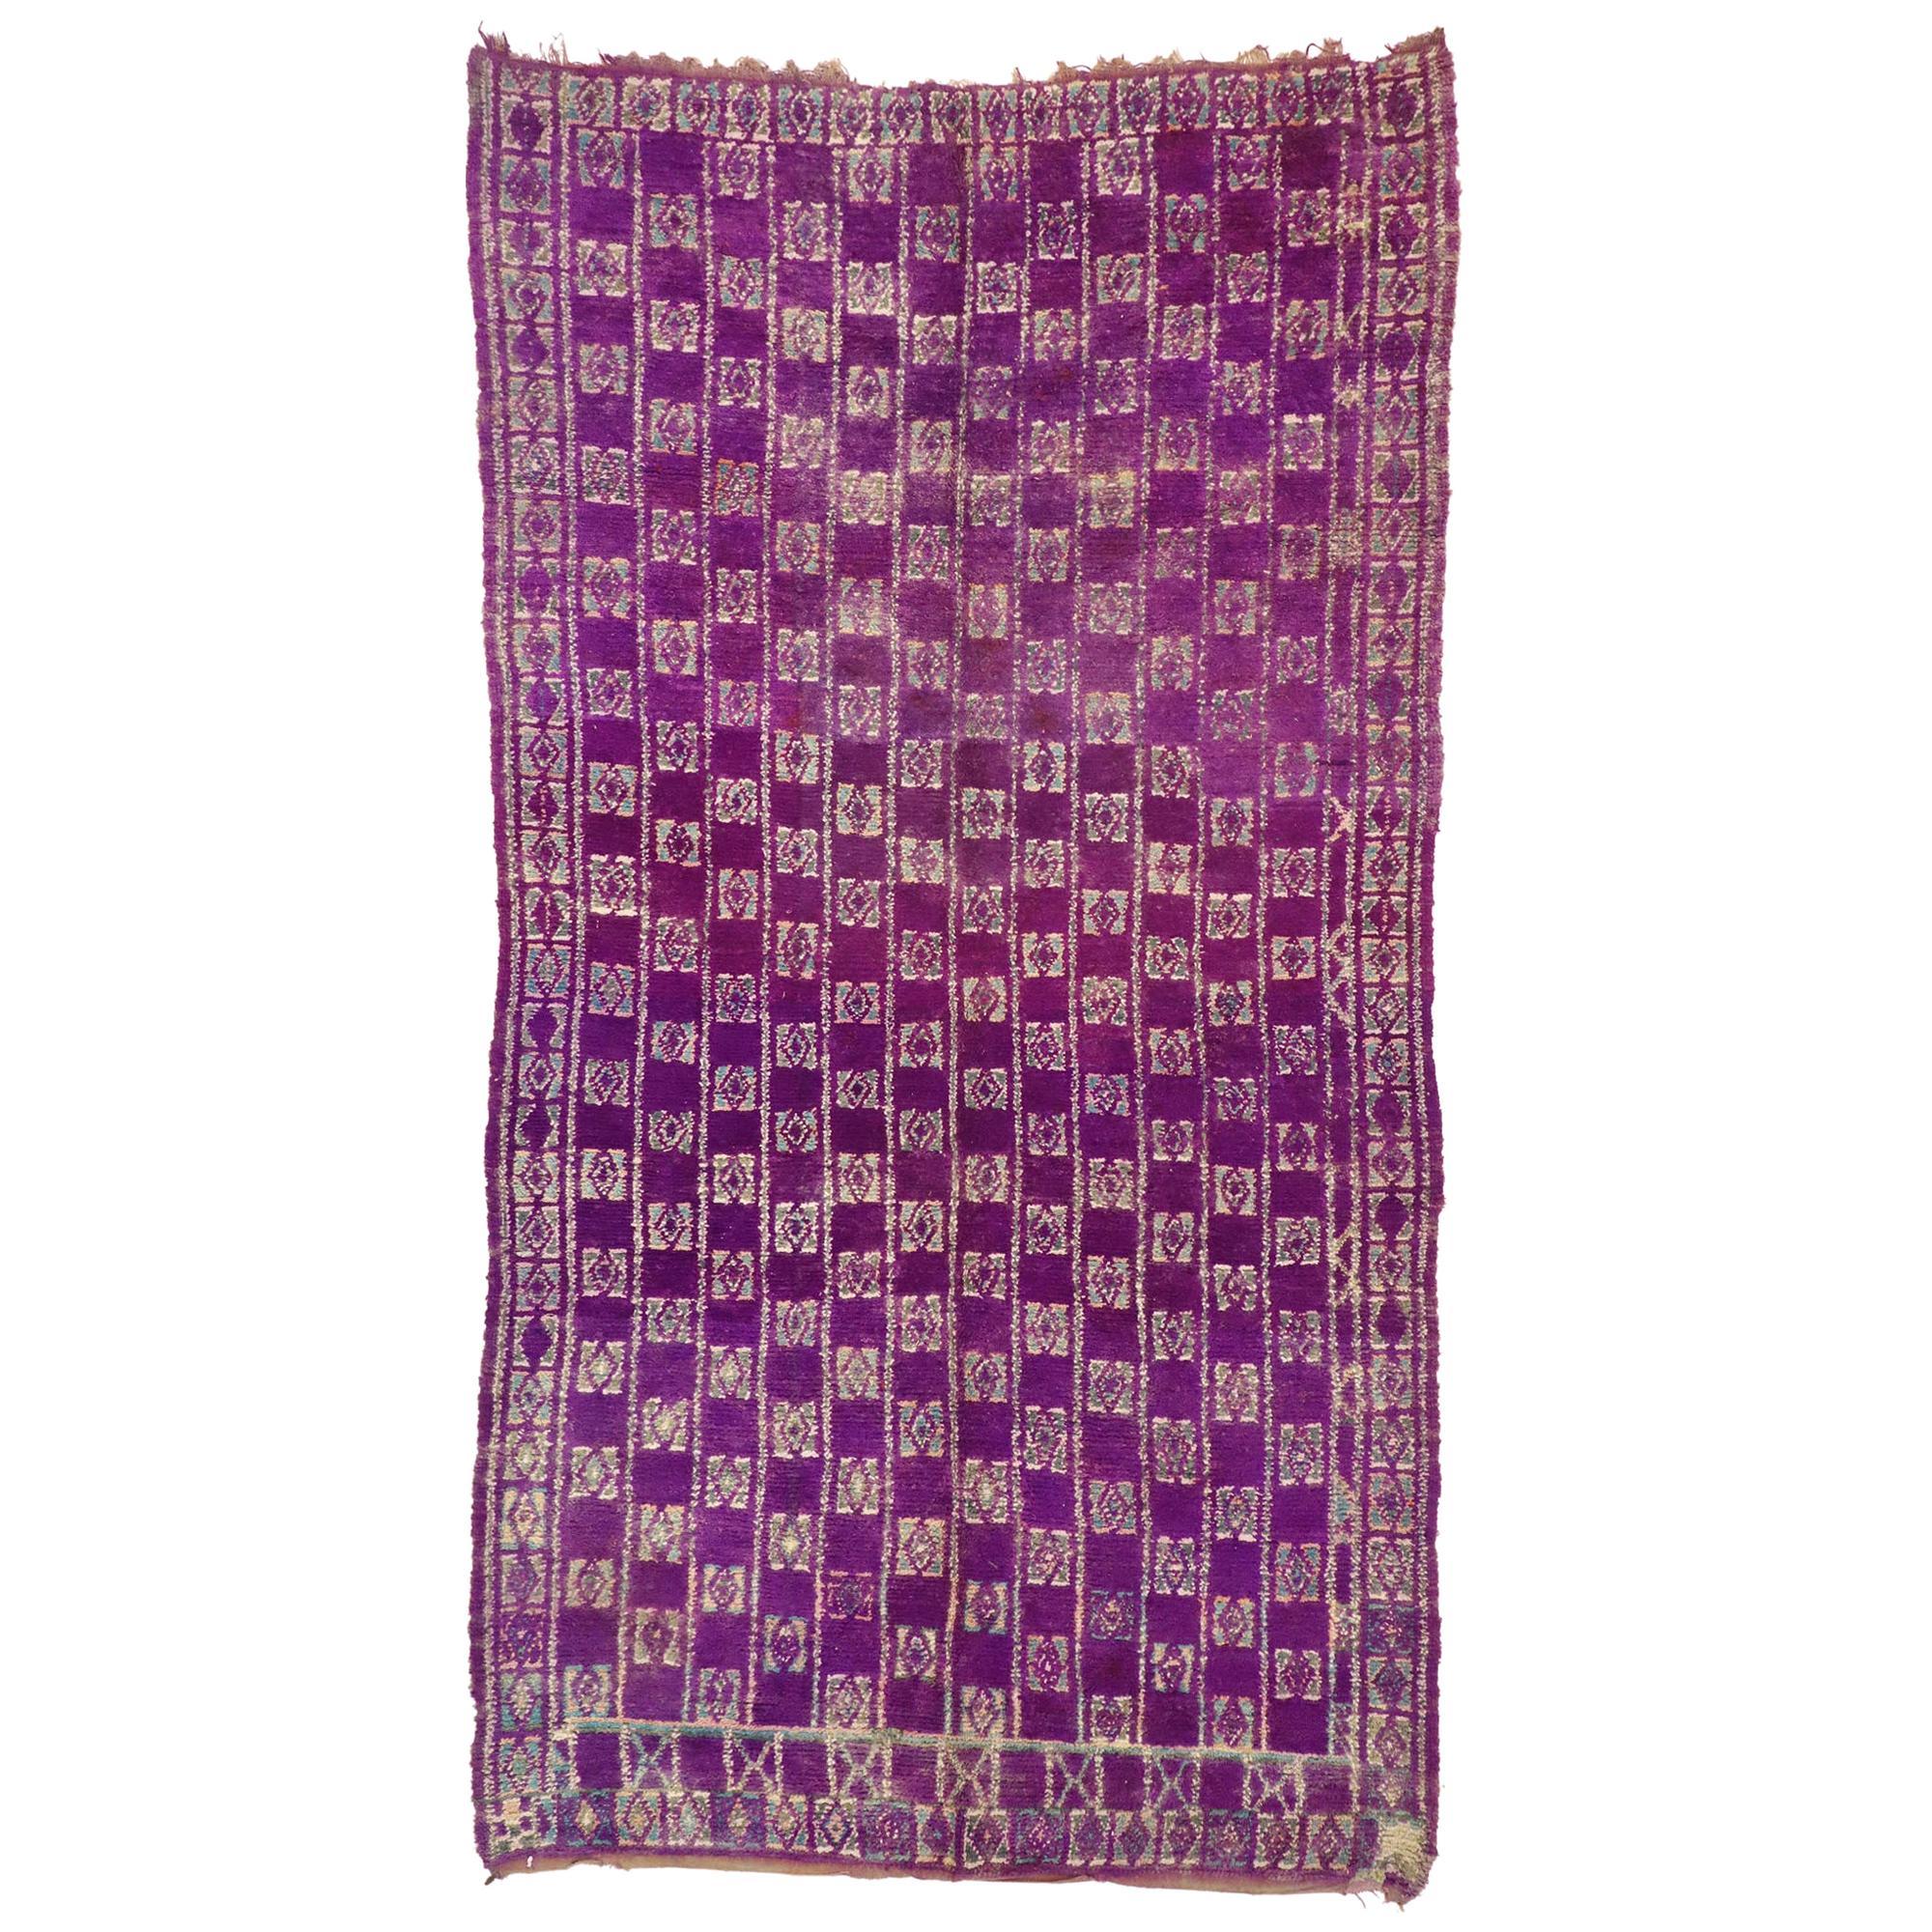 Vintage Berber Purple Moroccan Rug with Postmodern Boho Chic Style